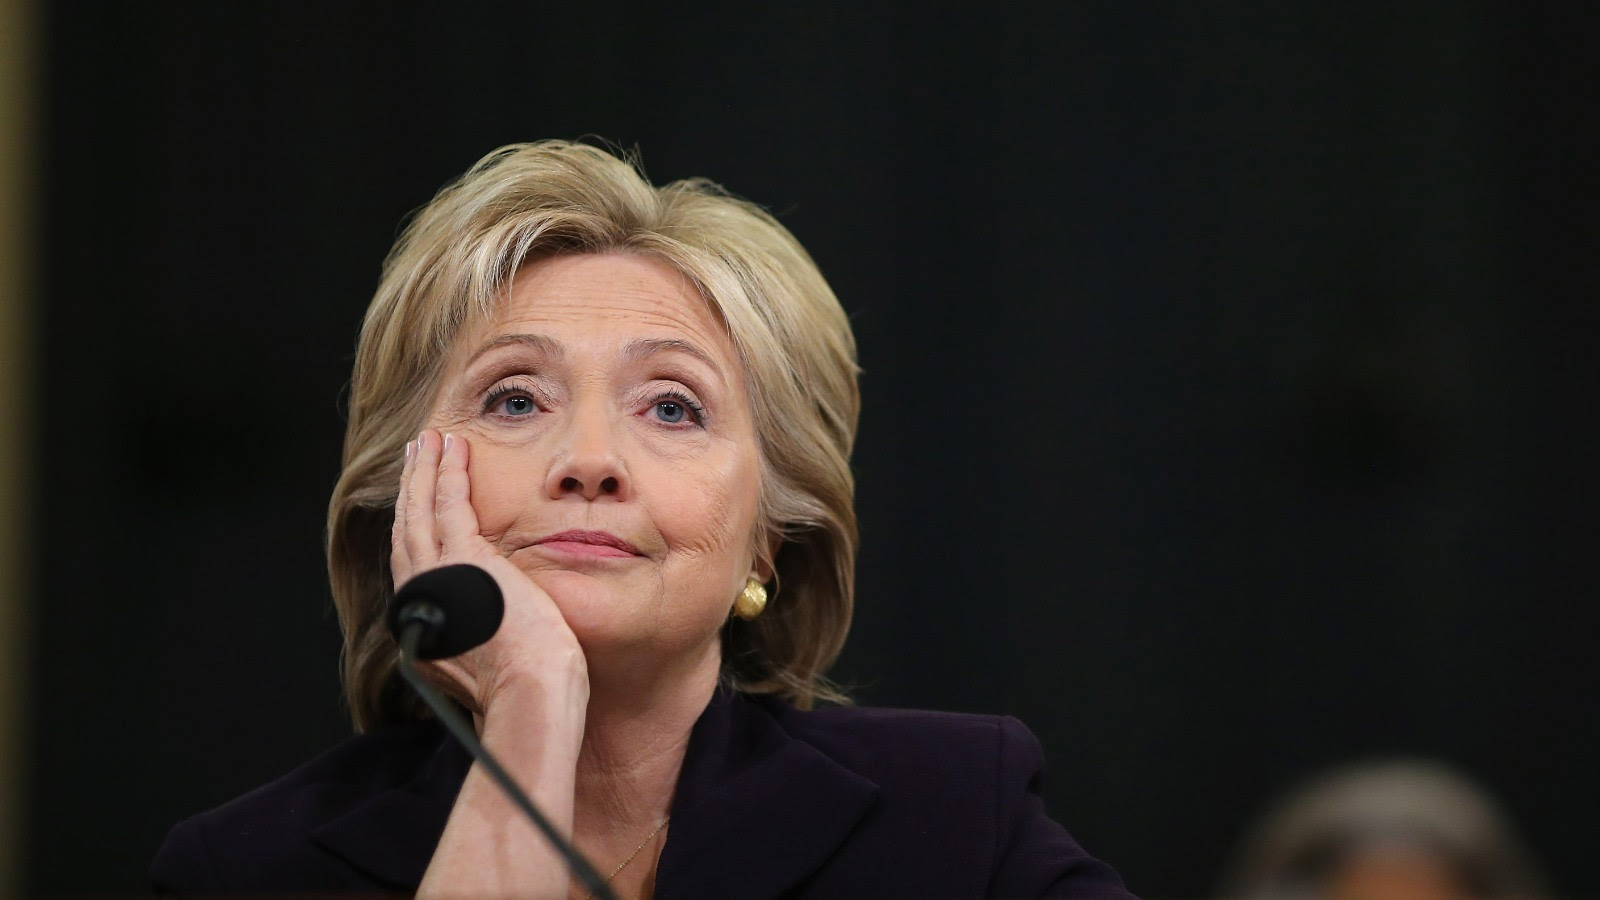 Hillary Clinton Benghazi testimony like a boss